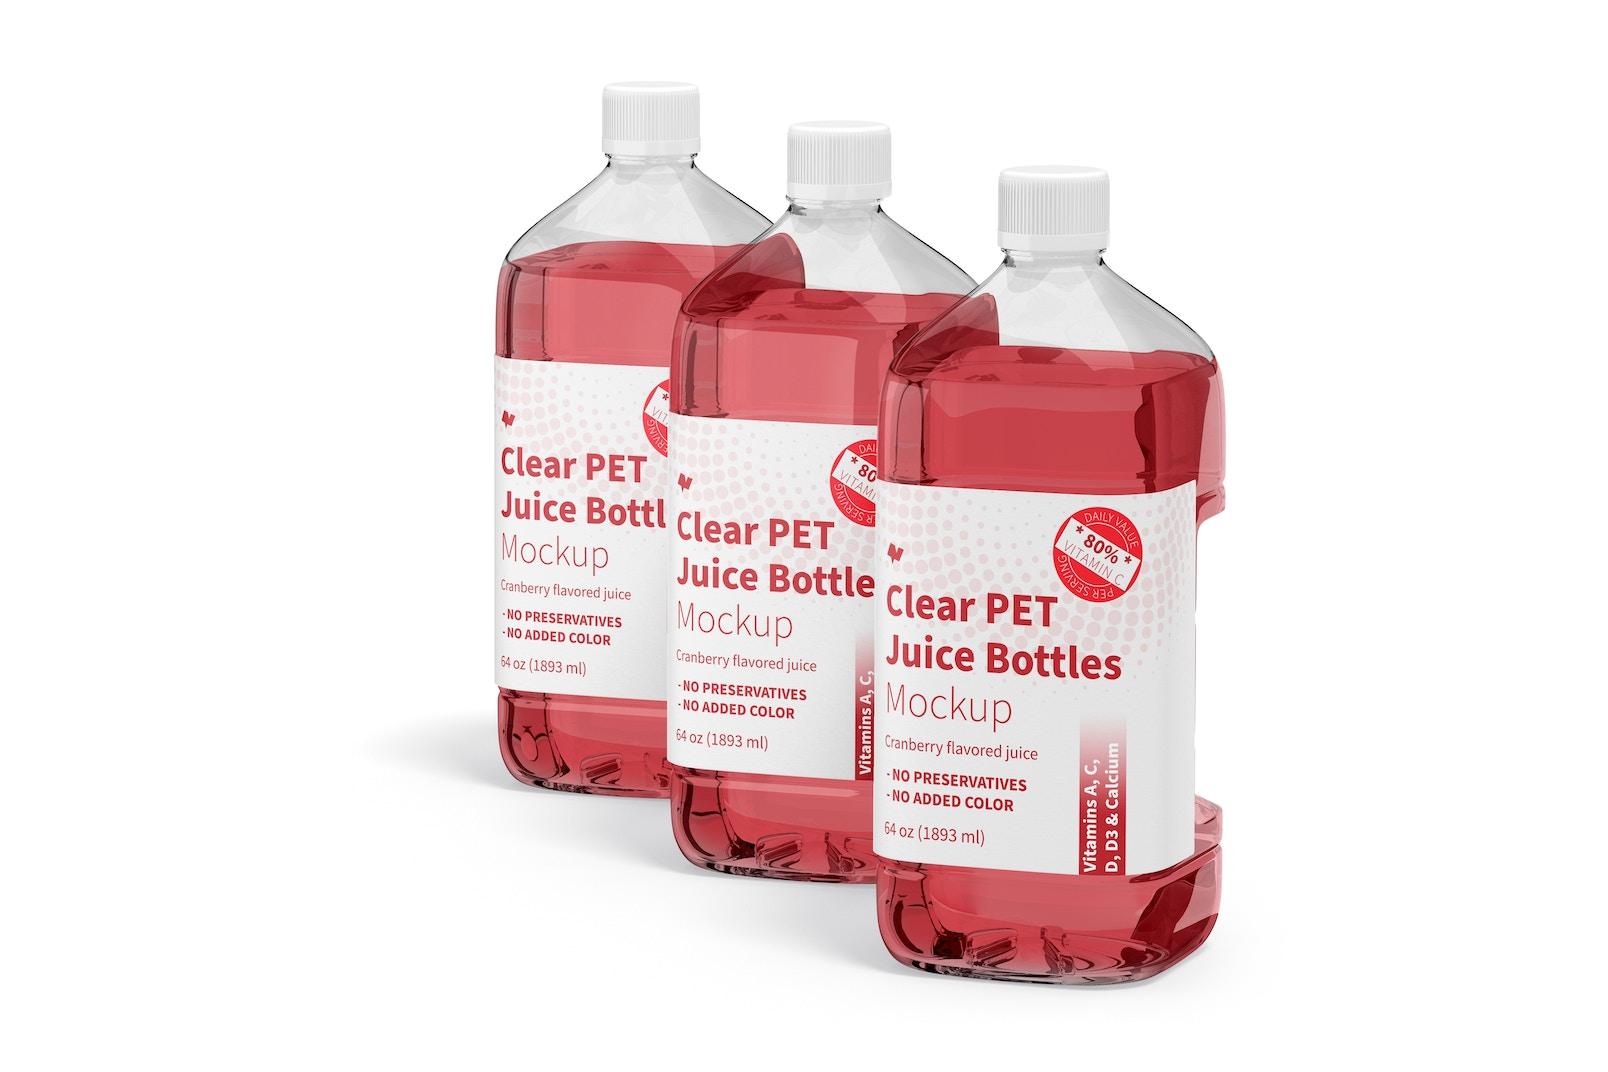 64 oz Clear PET Juice Bottles Mockup